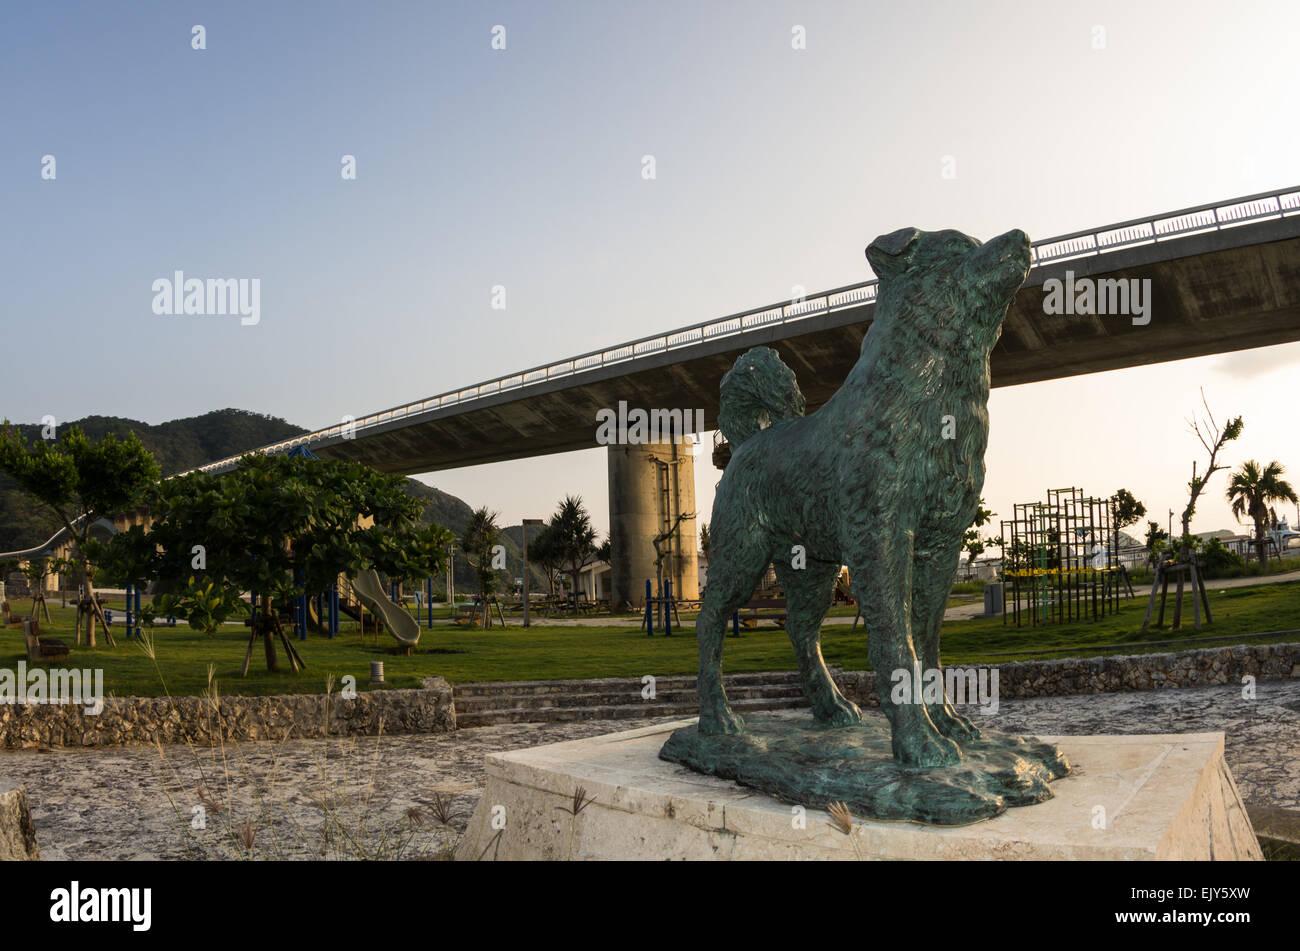 Statue of Shiro the Dog on Aka Island with bridge connecting to Geruma Island in the background, Keramas, Okinawa, Stock Photo